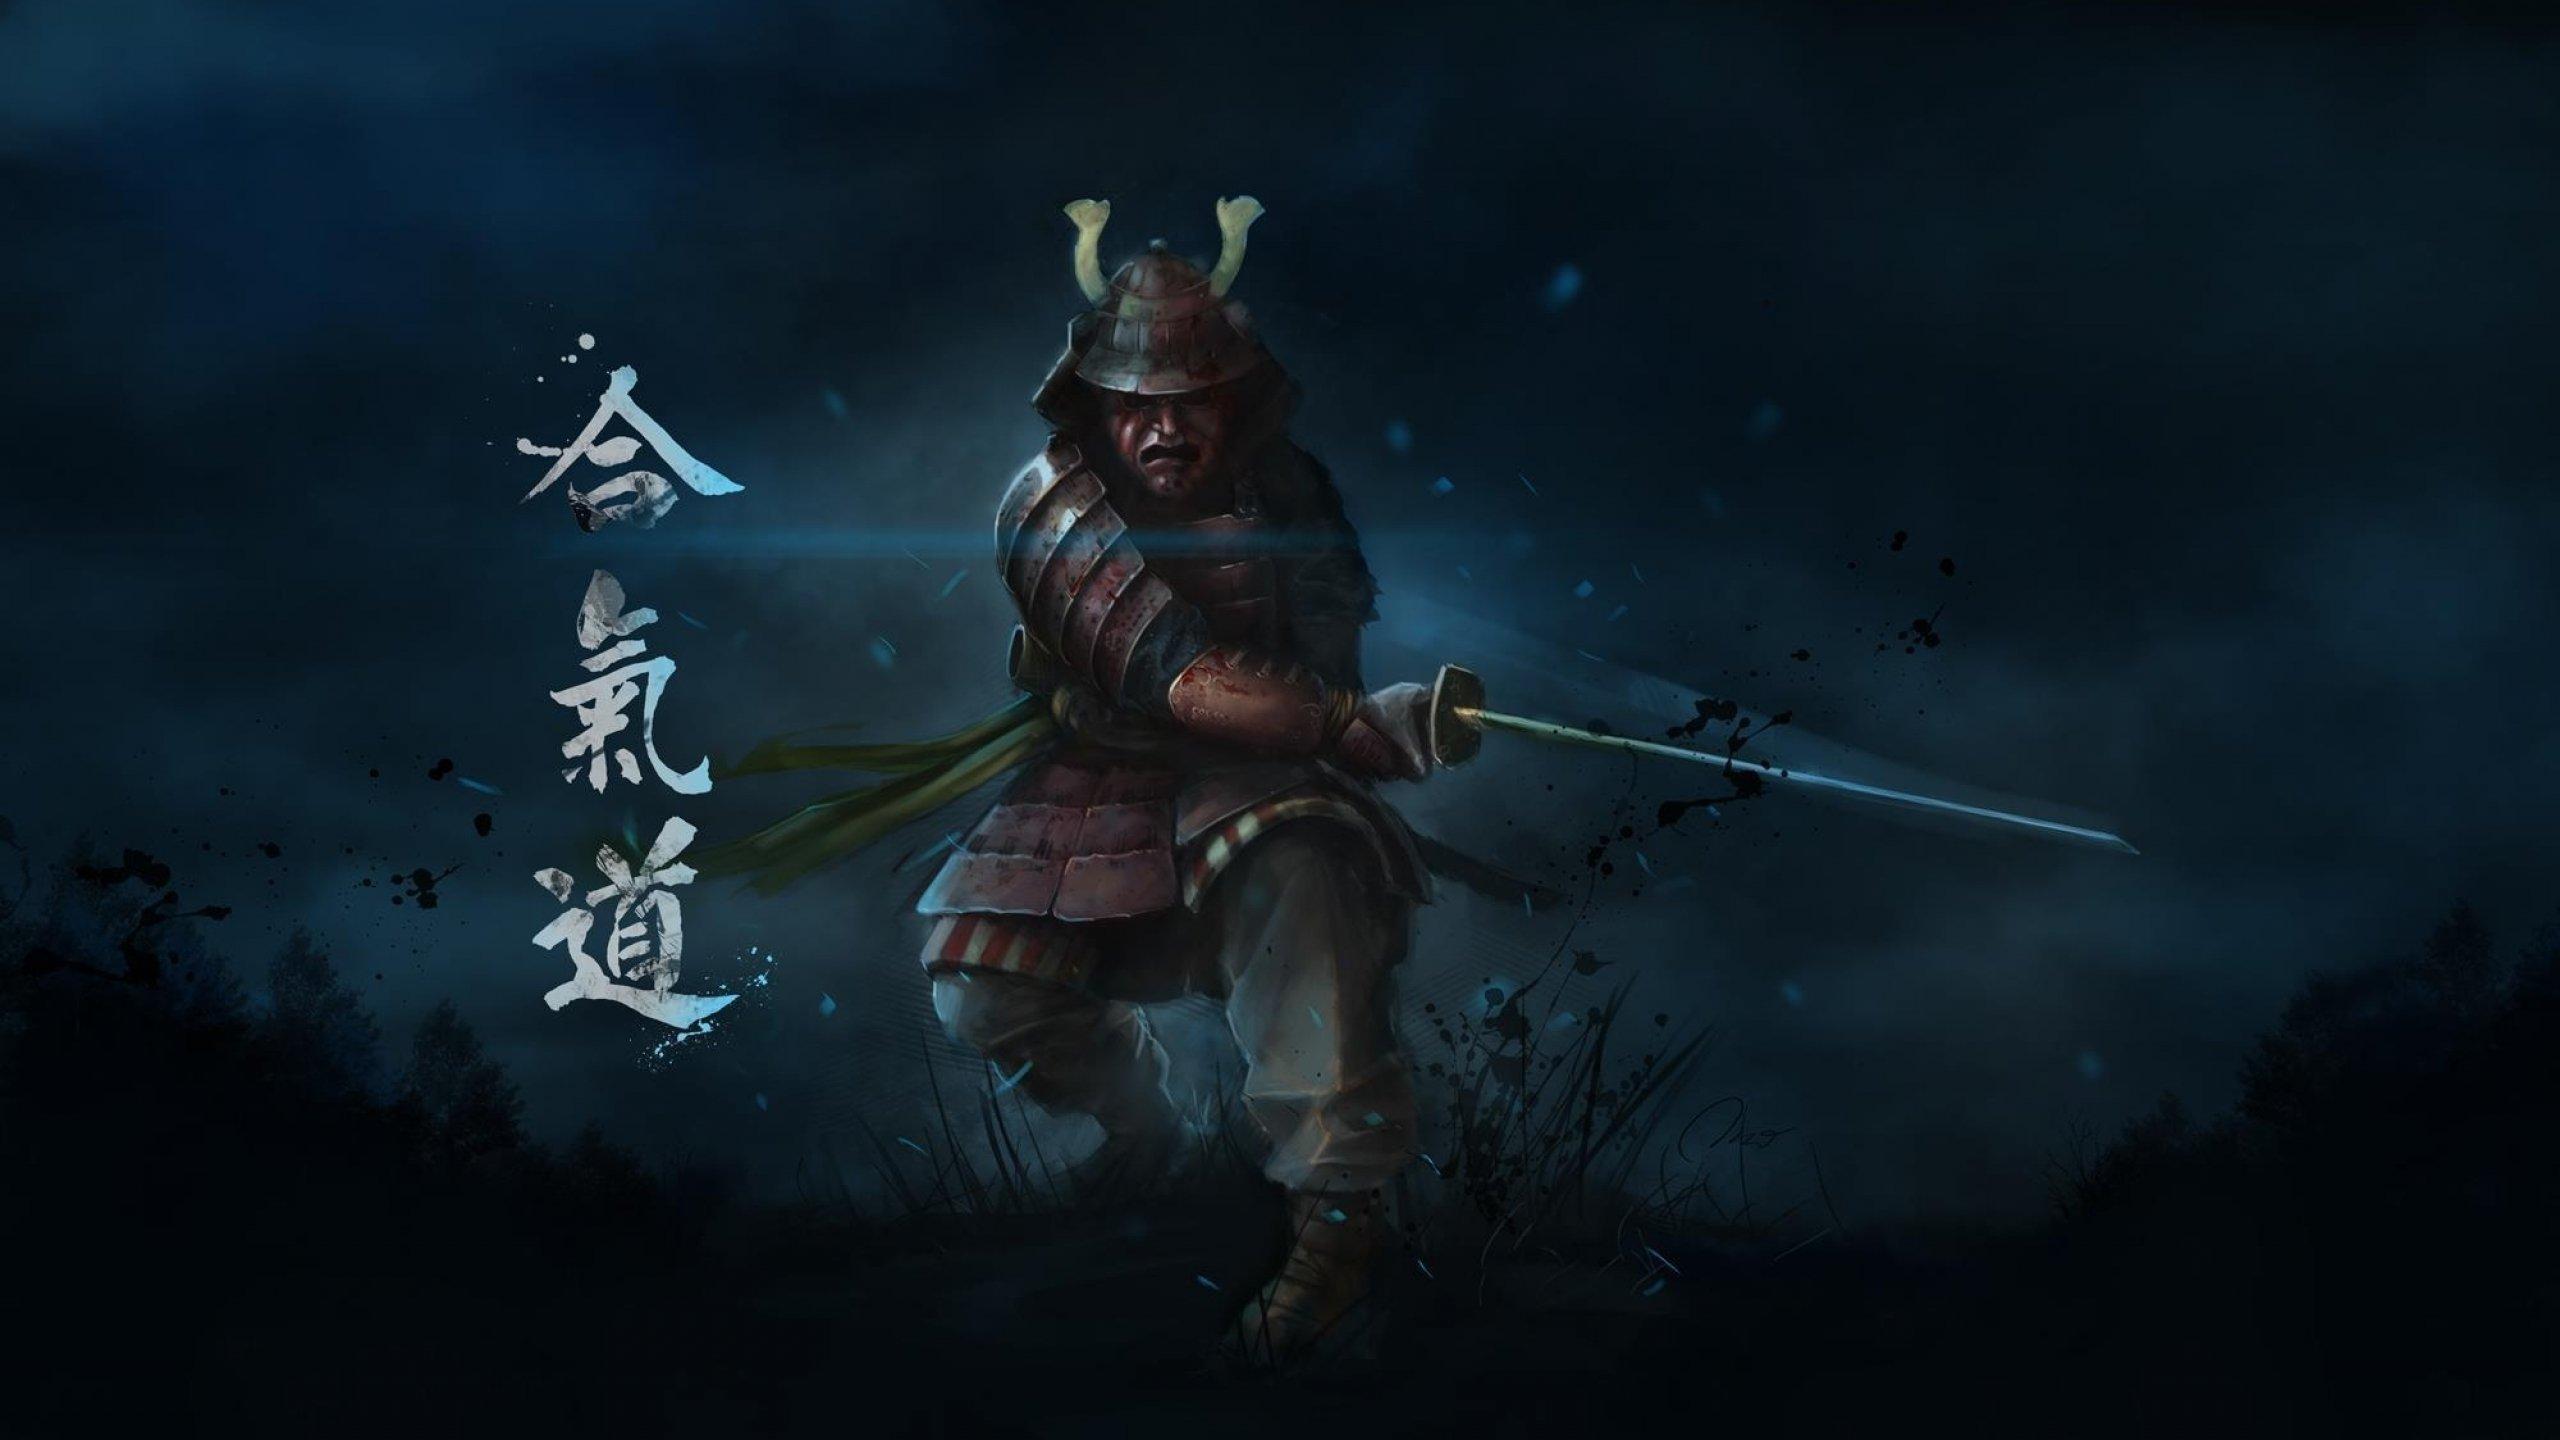 Japanese Samurai Girl Wallpaper Samurai Warrior Fantasy Art Artwork Asian Wallpaper